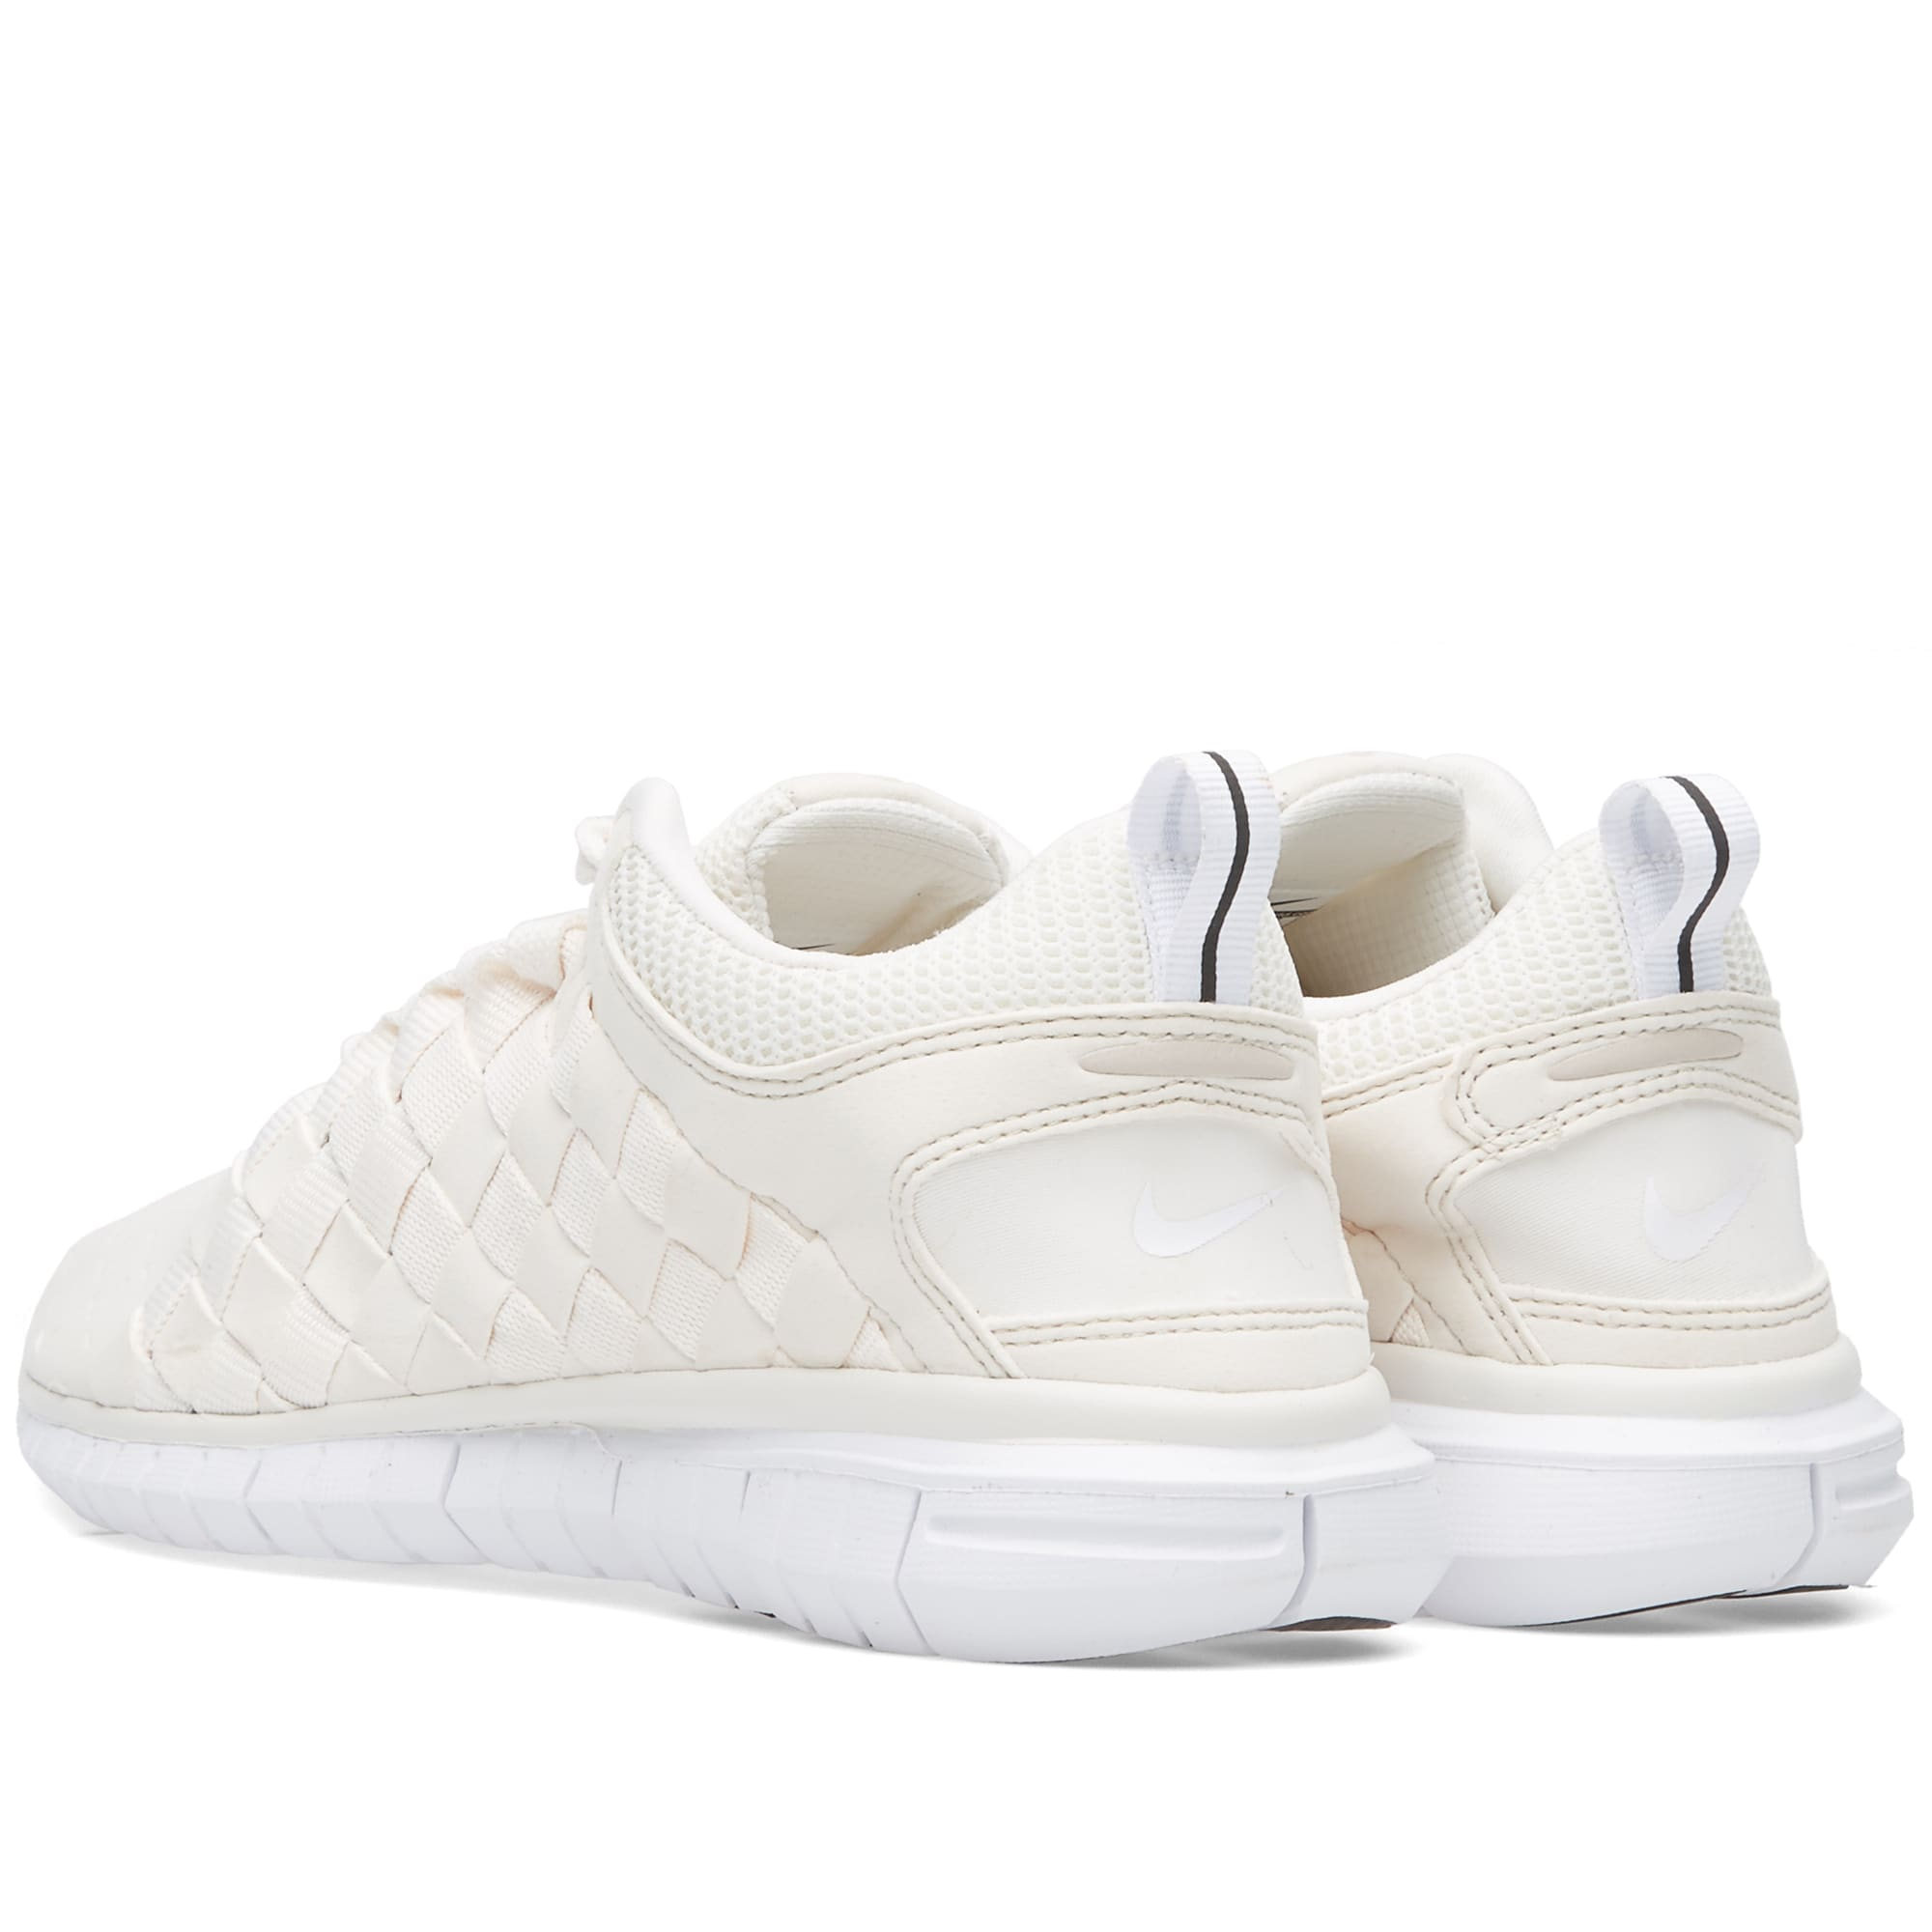 reputable site da078 66973 Nike Free OG  14 Woven Phantom   White   END.